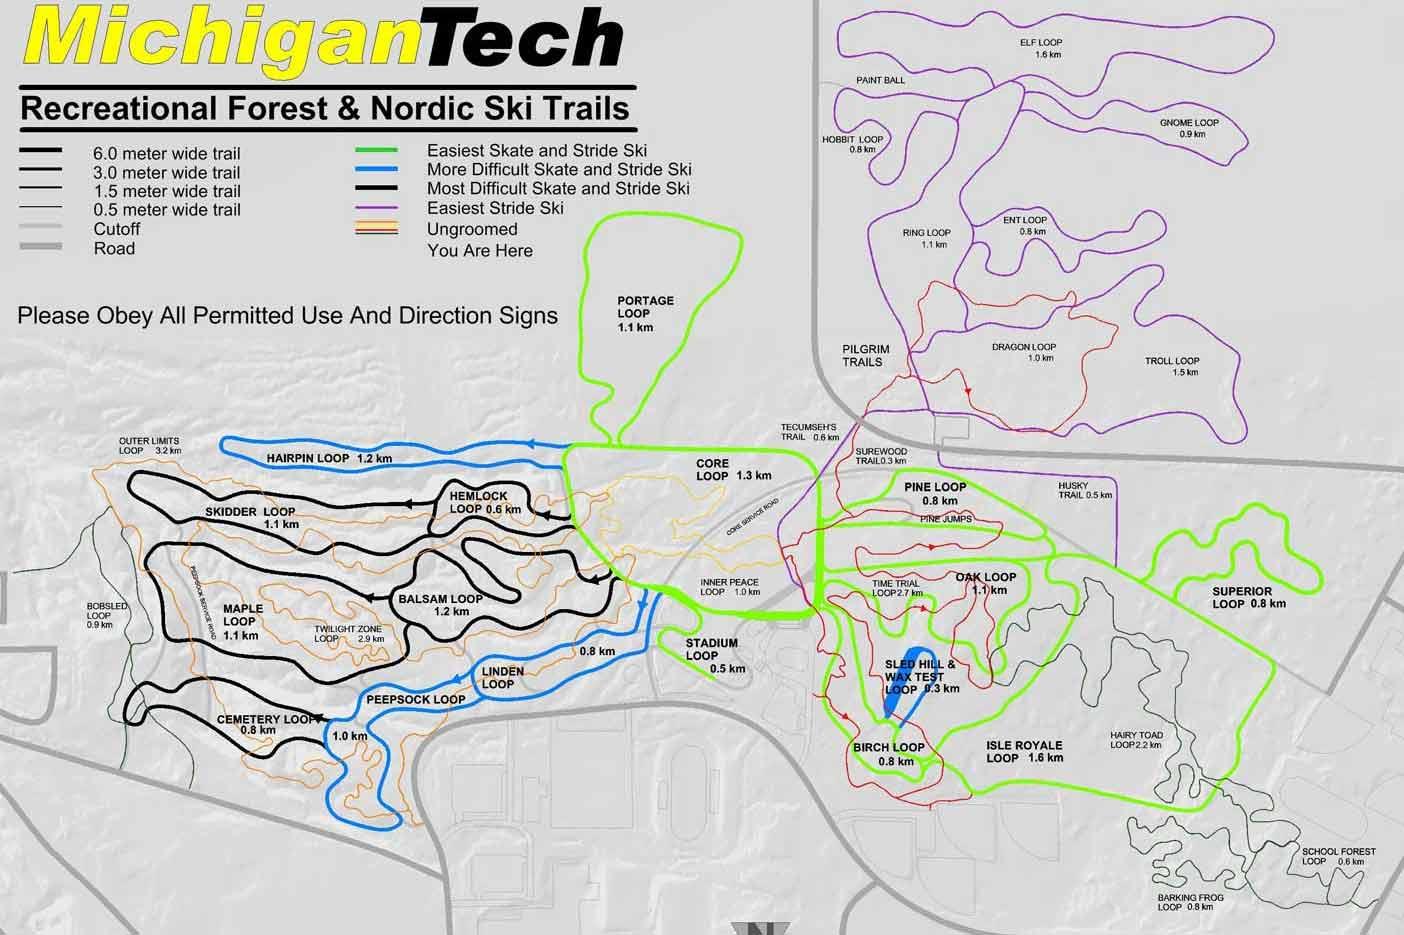 Michigan Tech Nordic Ski Trails trail map, Michigan Tech ... on hiking michigan map, kayak michigan map, lake huron fishing map, norway michigan map, camping michigan map, travel michigan map, golf michigan map, boyne highlands map, lake michigan map, mountain michigan map, hotels michigan map, christmas michigan map, northern wisconsin upper peninsula michigan map, ski north dakota, garden michigan map,